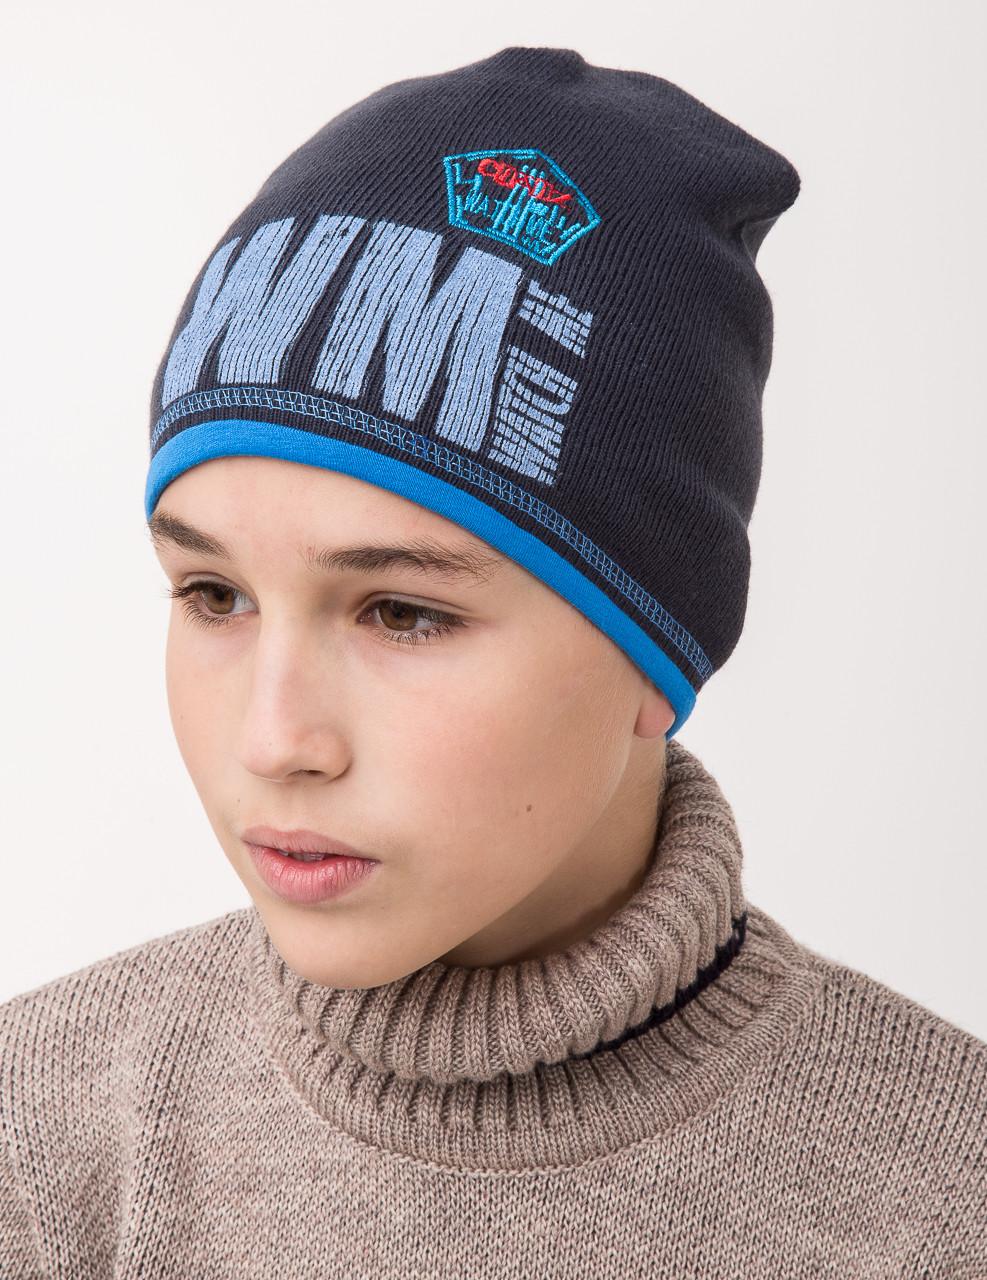 Осенняя вязанная шапка на мальчика от производителя - Watch me - Артикул 2137